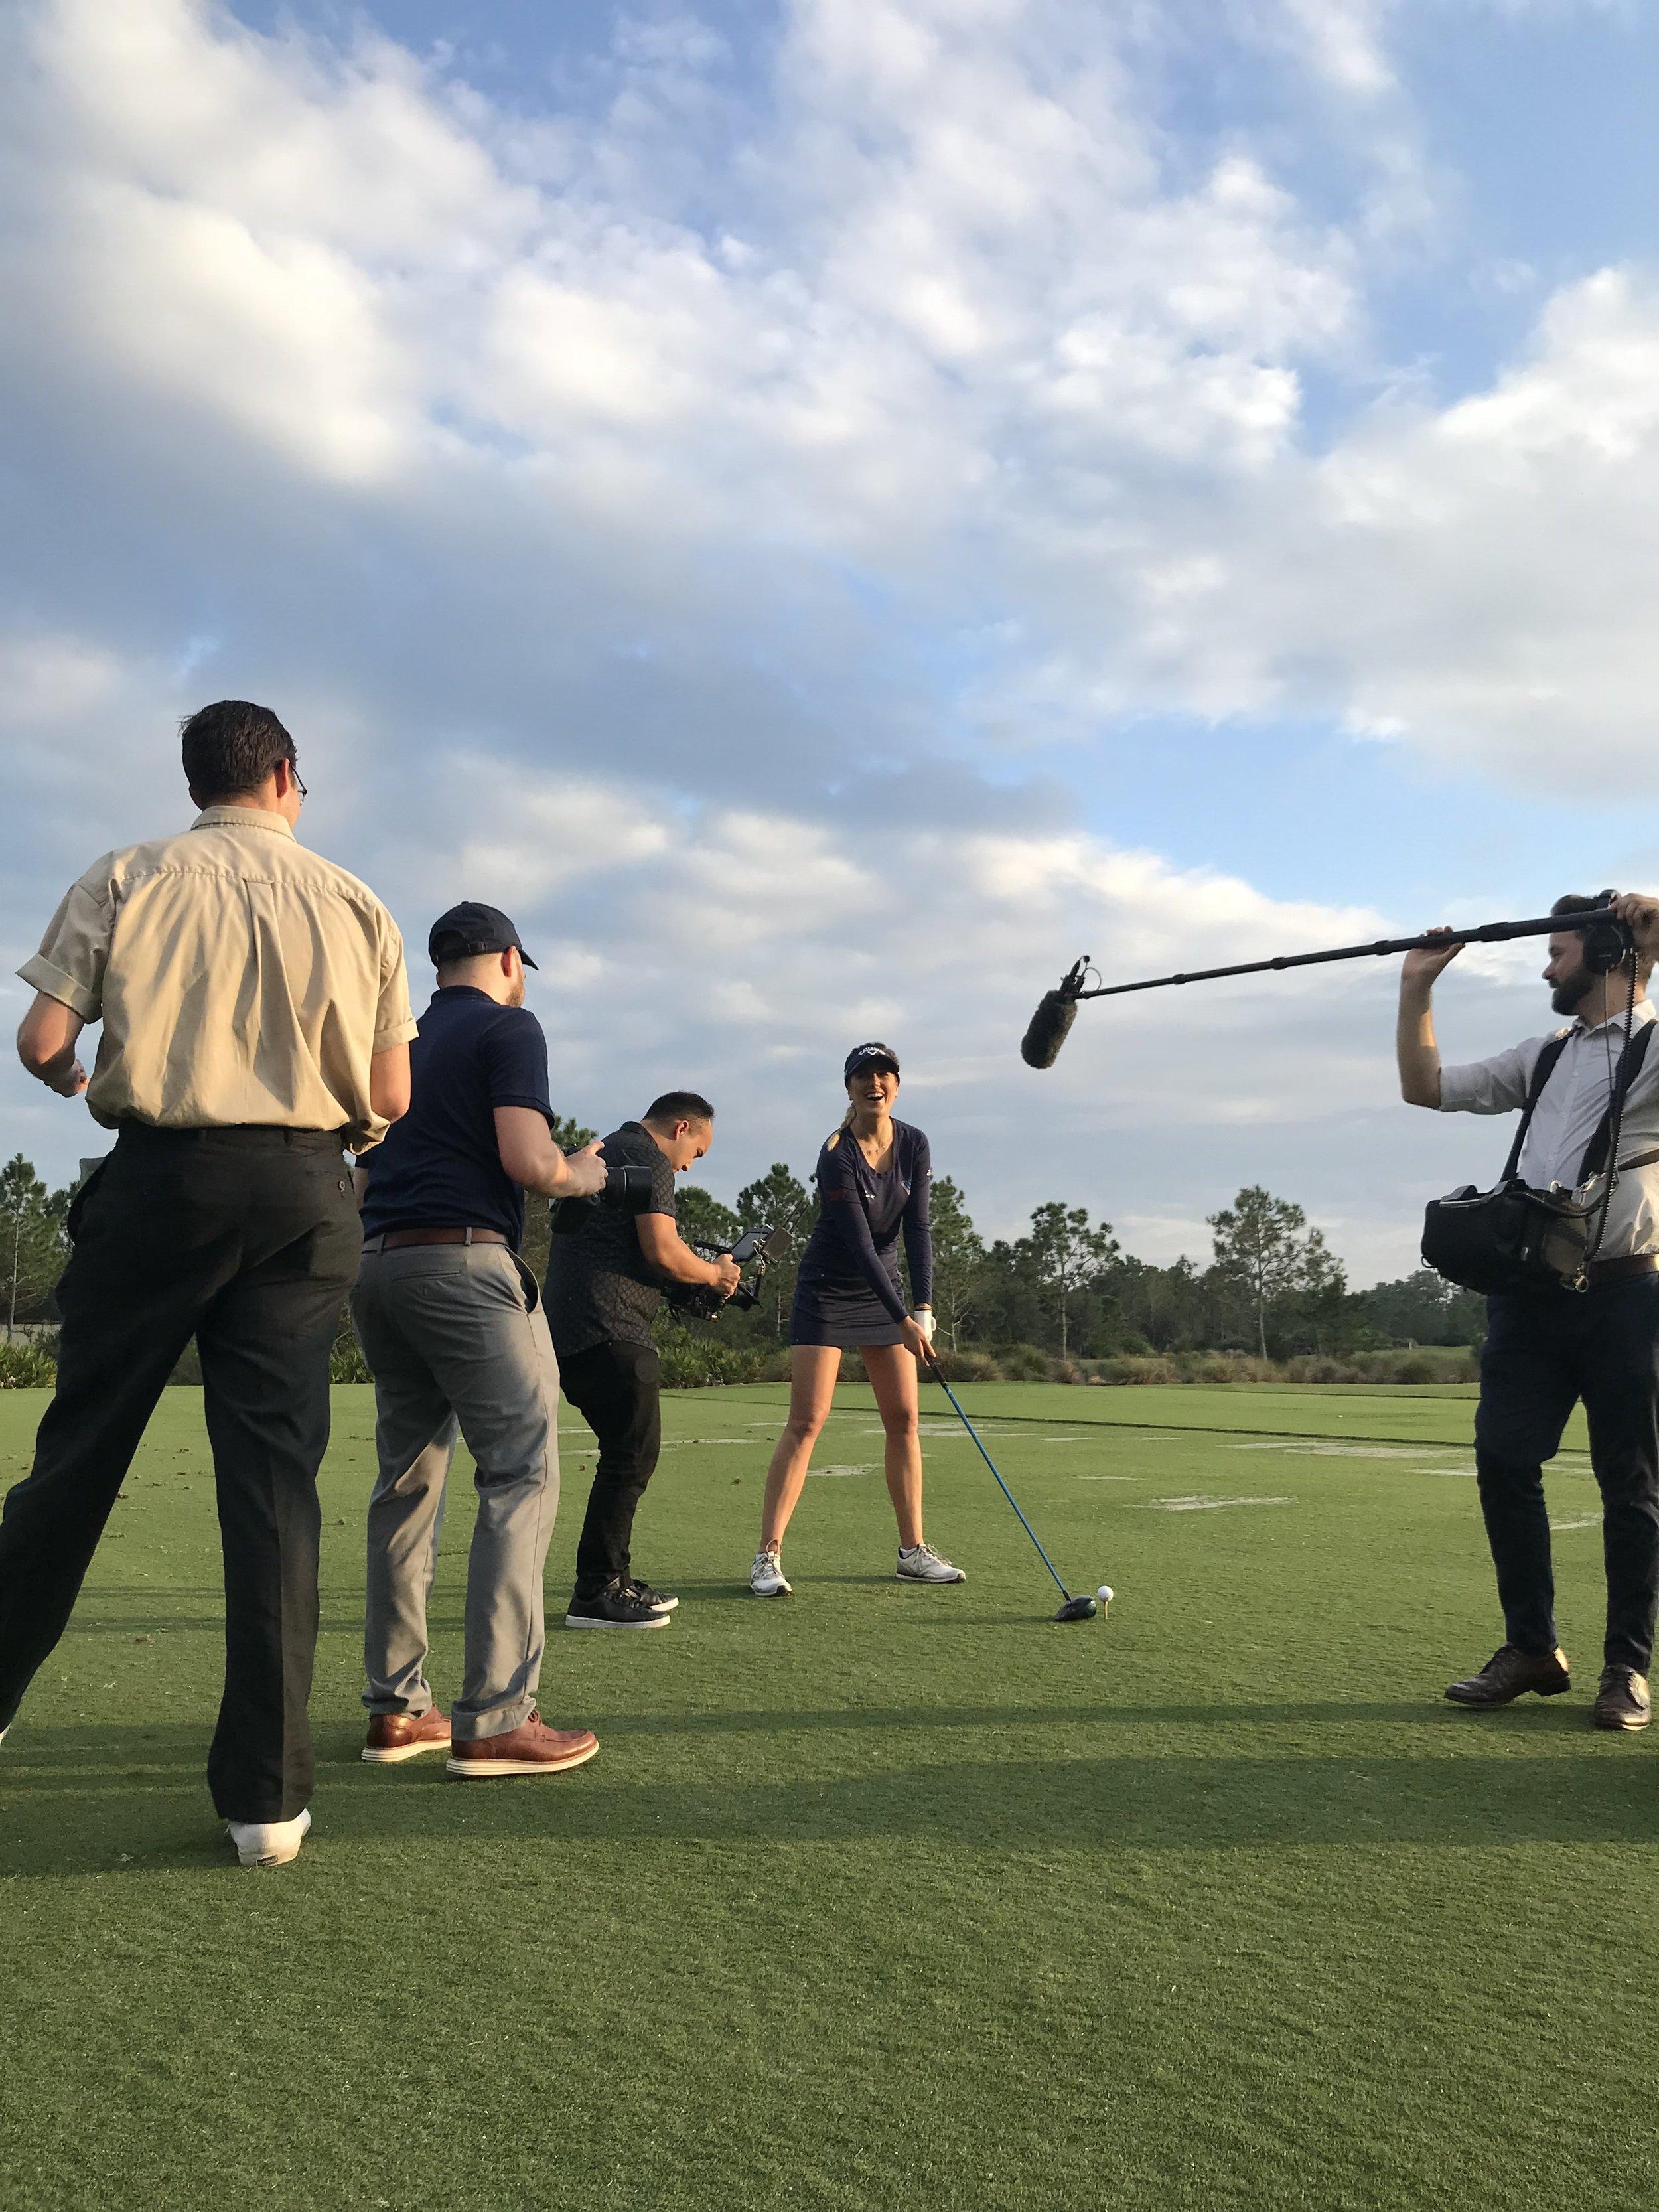 Nick Pecori Tampa Orlando Advertising Commercial Photographer for Acer LPGA Golfer Sandra Gal - 15.JPG